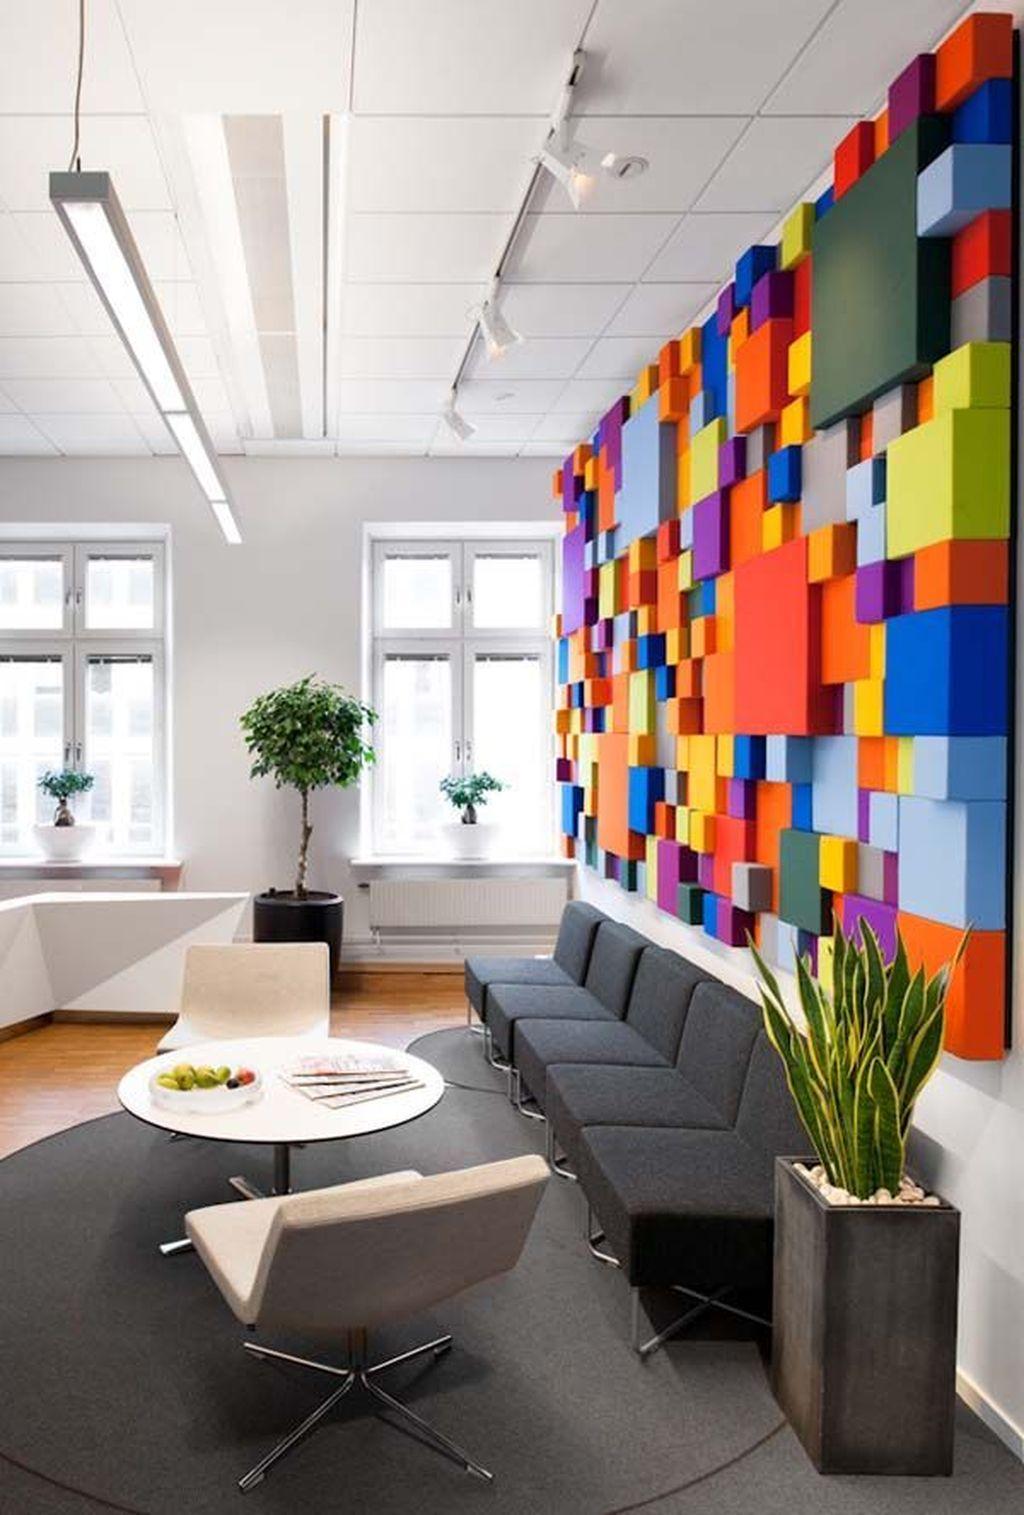 The Best Office Artwork Design Ideas 02